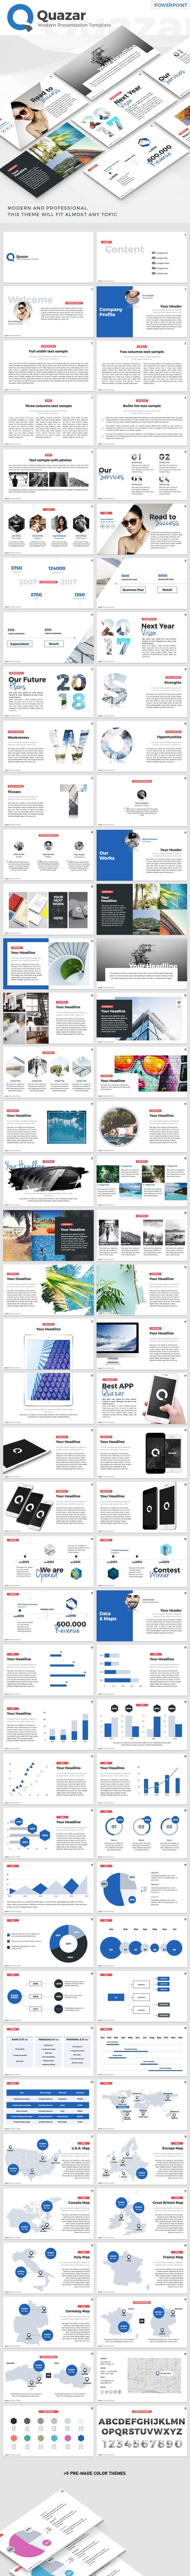 Quazar - Modern PowerPoint Template - Business PowerPoint Templates